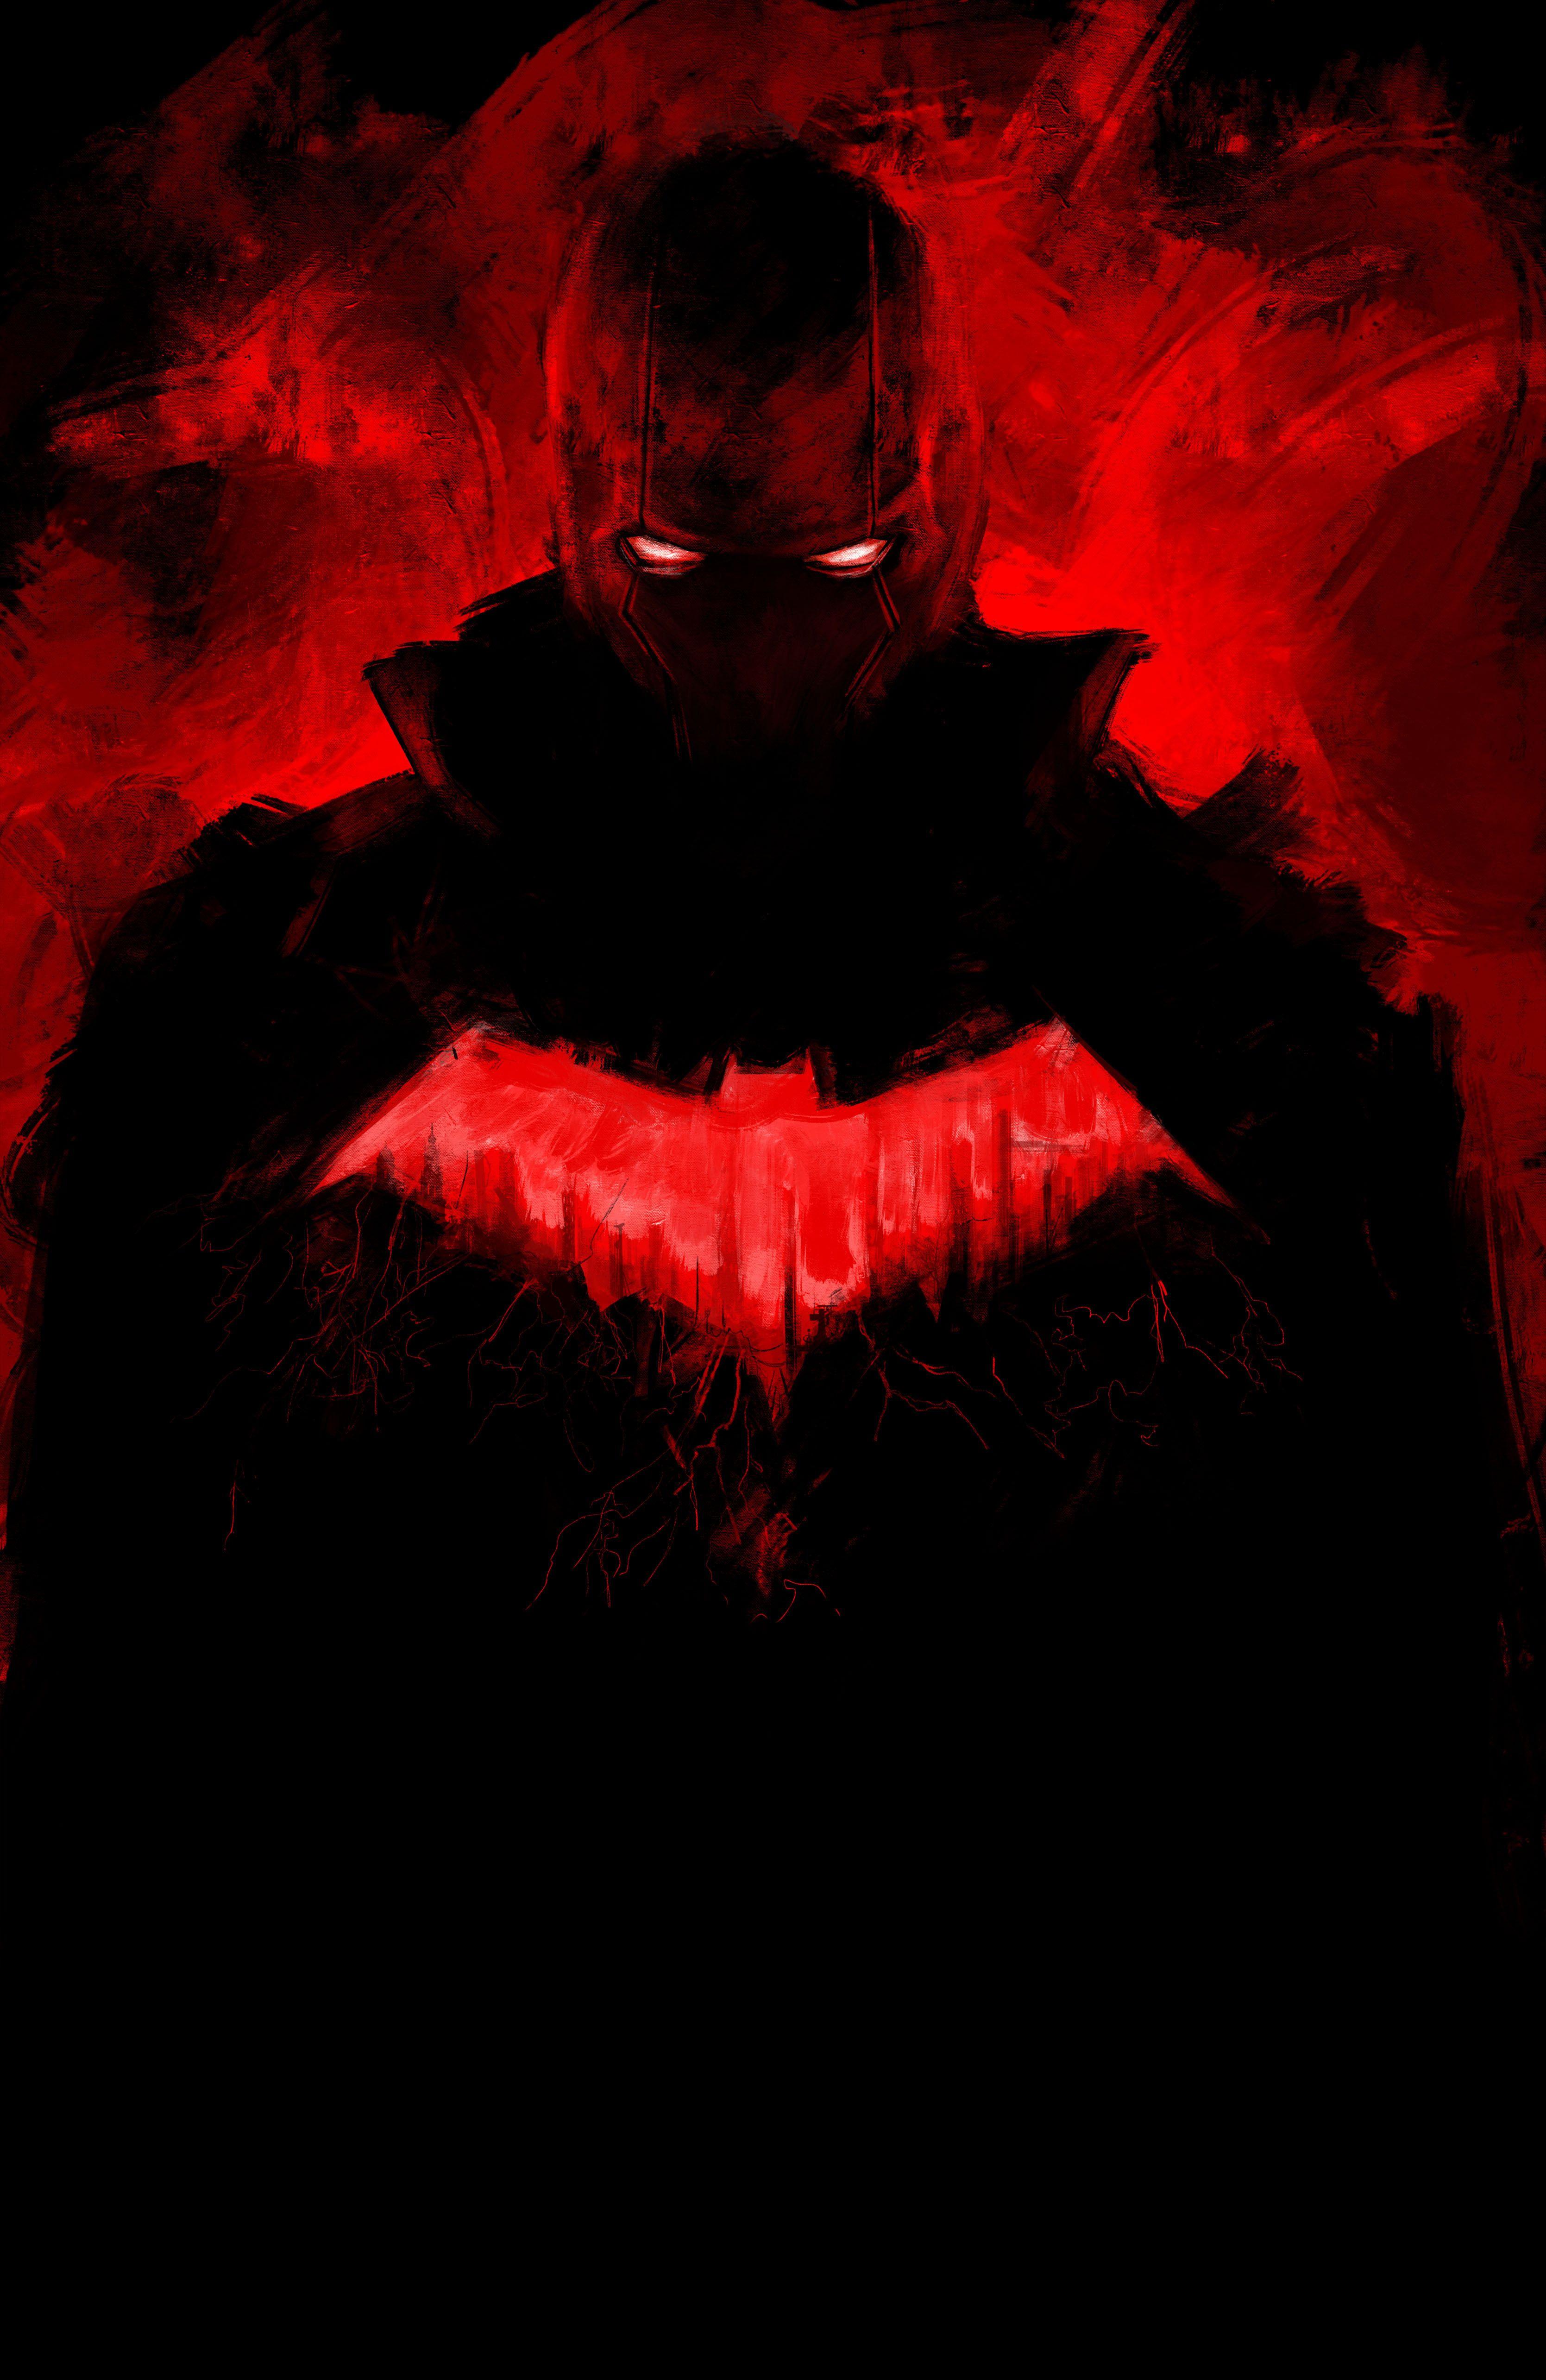 Pin By Tt 0805 On Red Hood Batman Red Hood Red Hood Red Hood Wallpaper